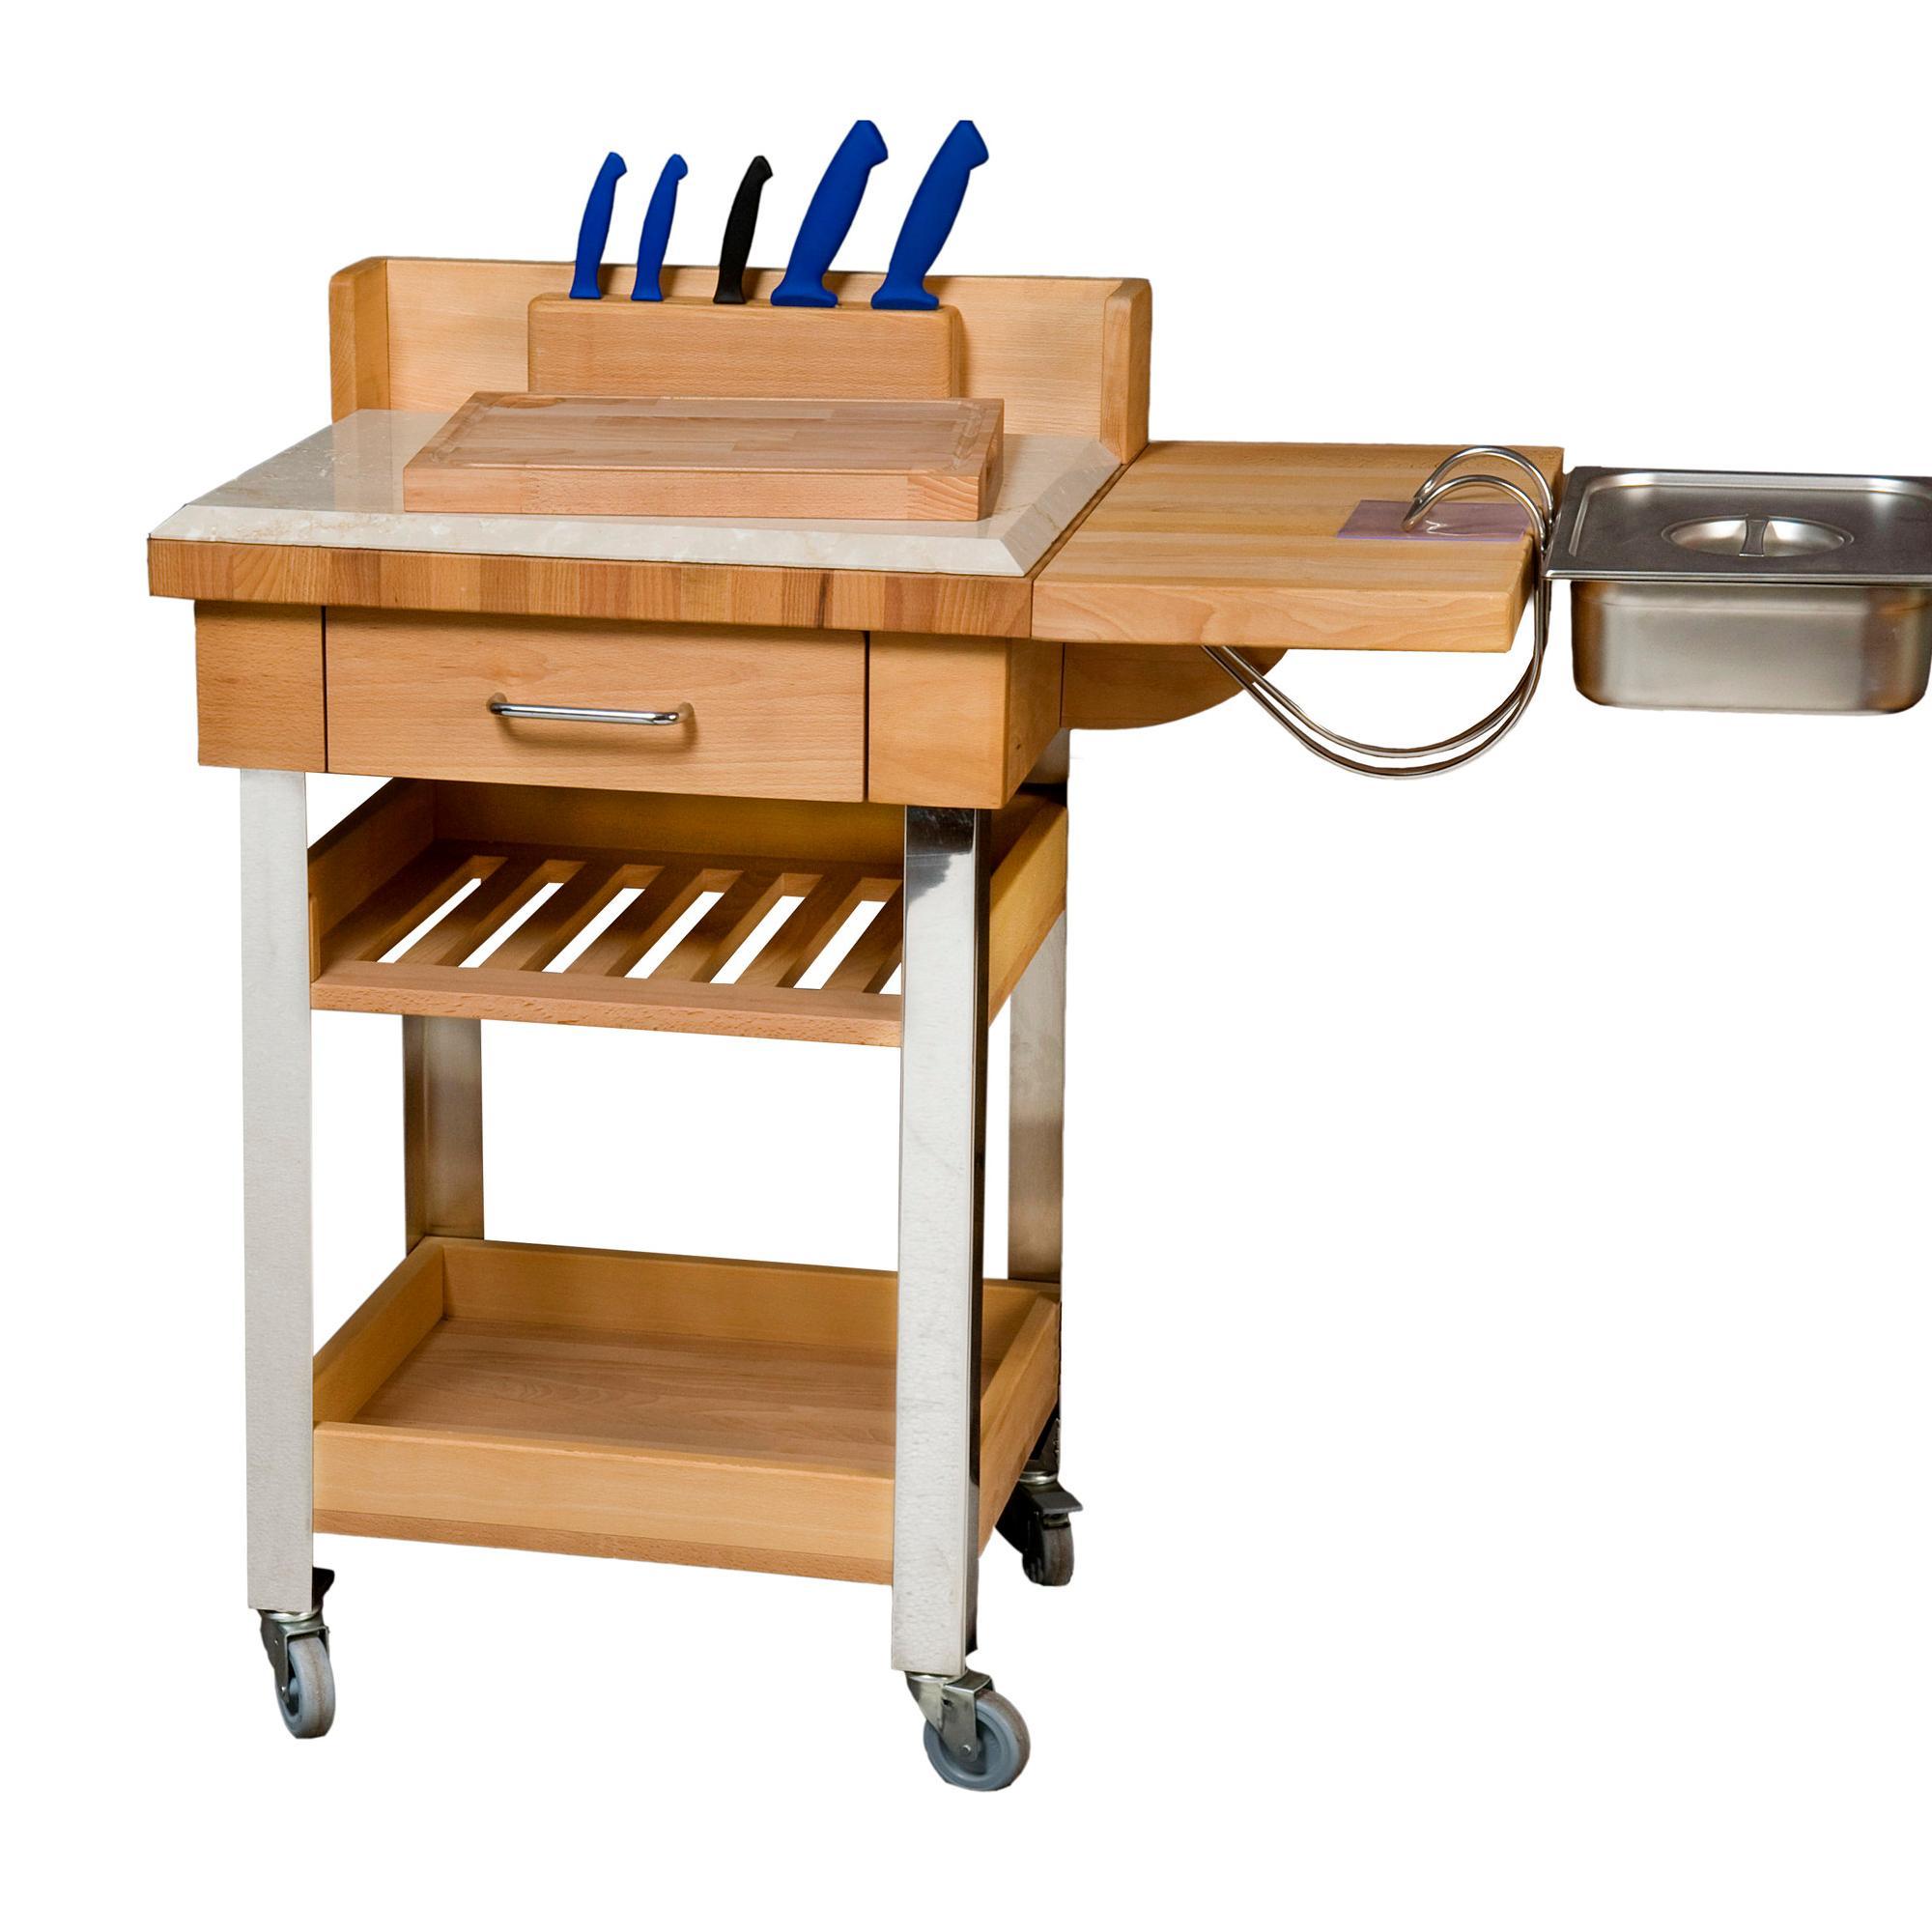 Carrello da cucina a servire 60x50xh88 cm in legno listellare di ...